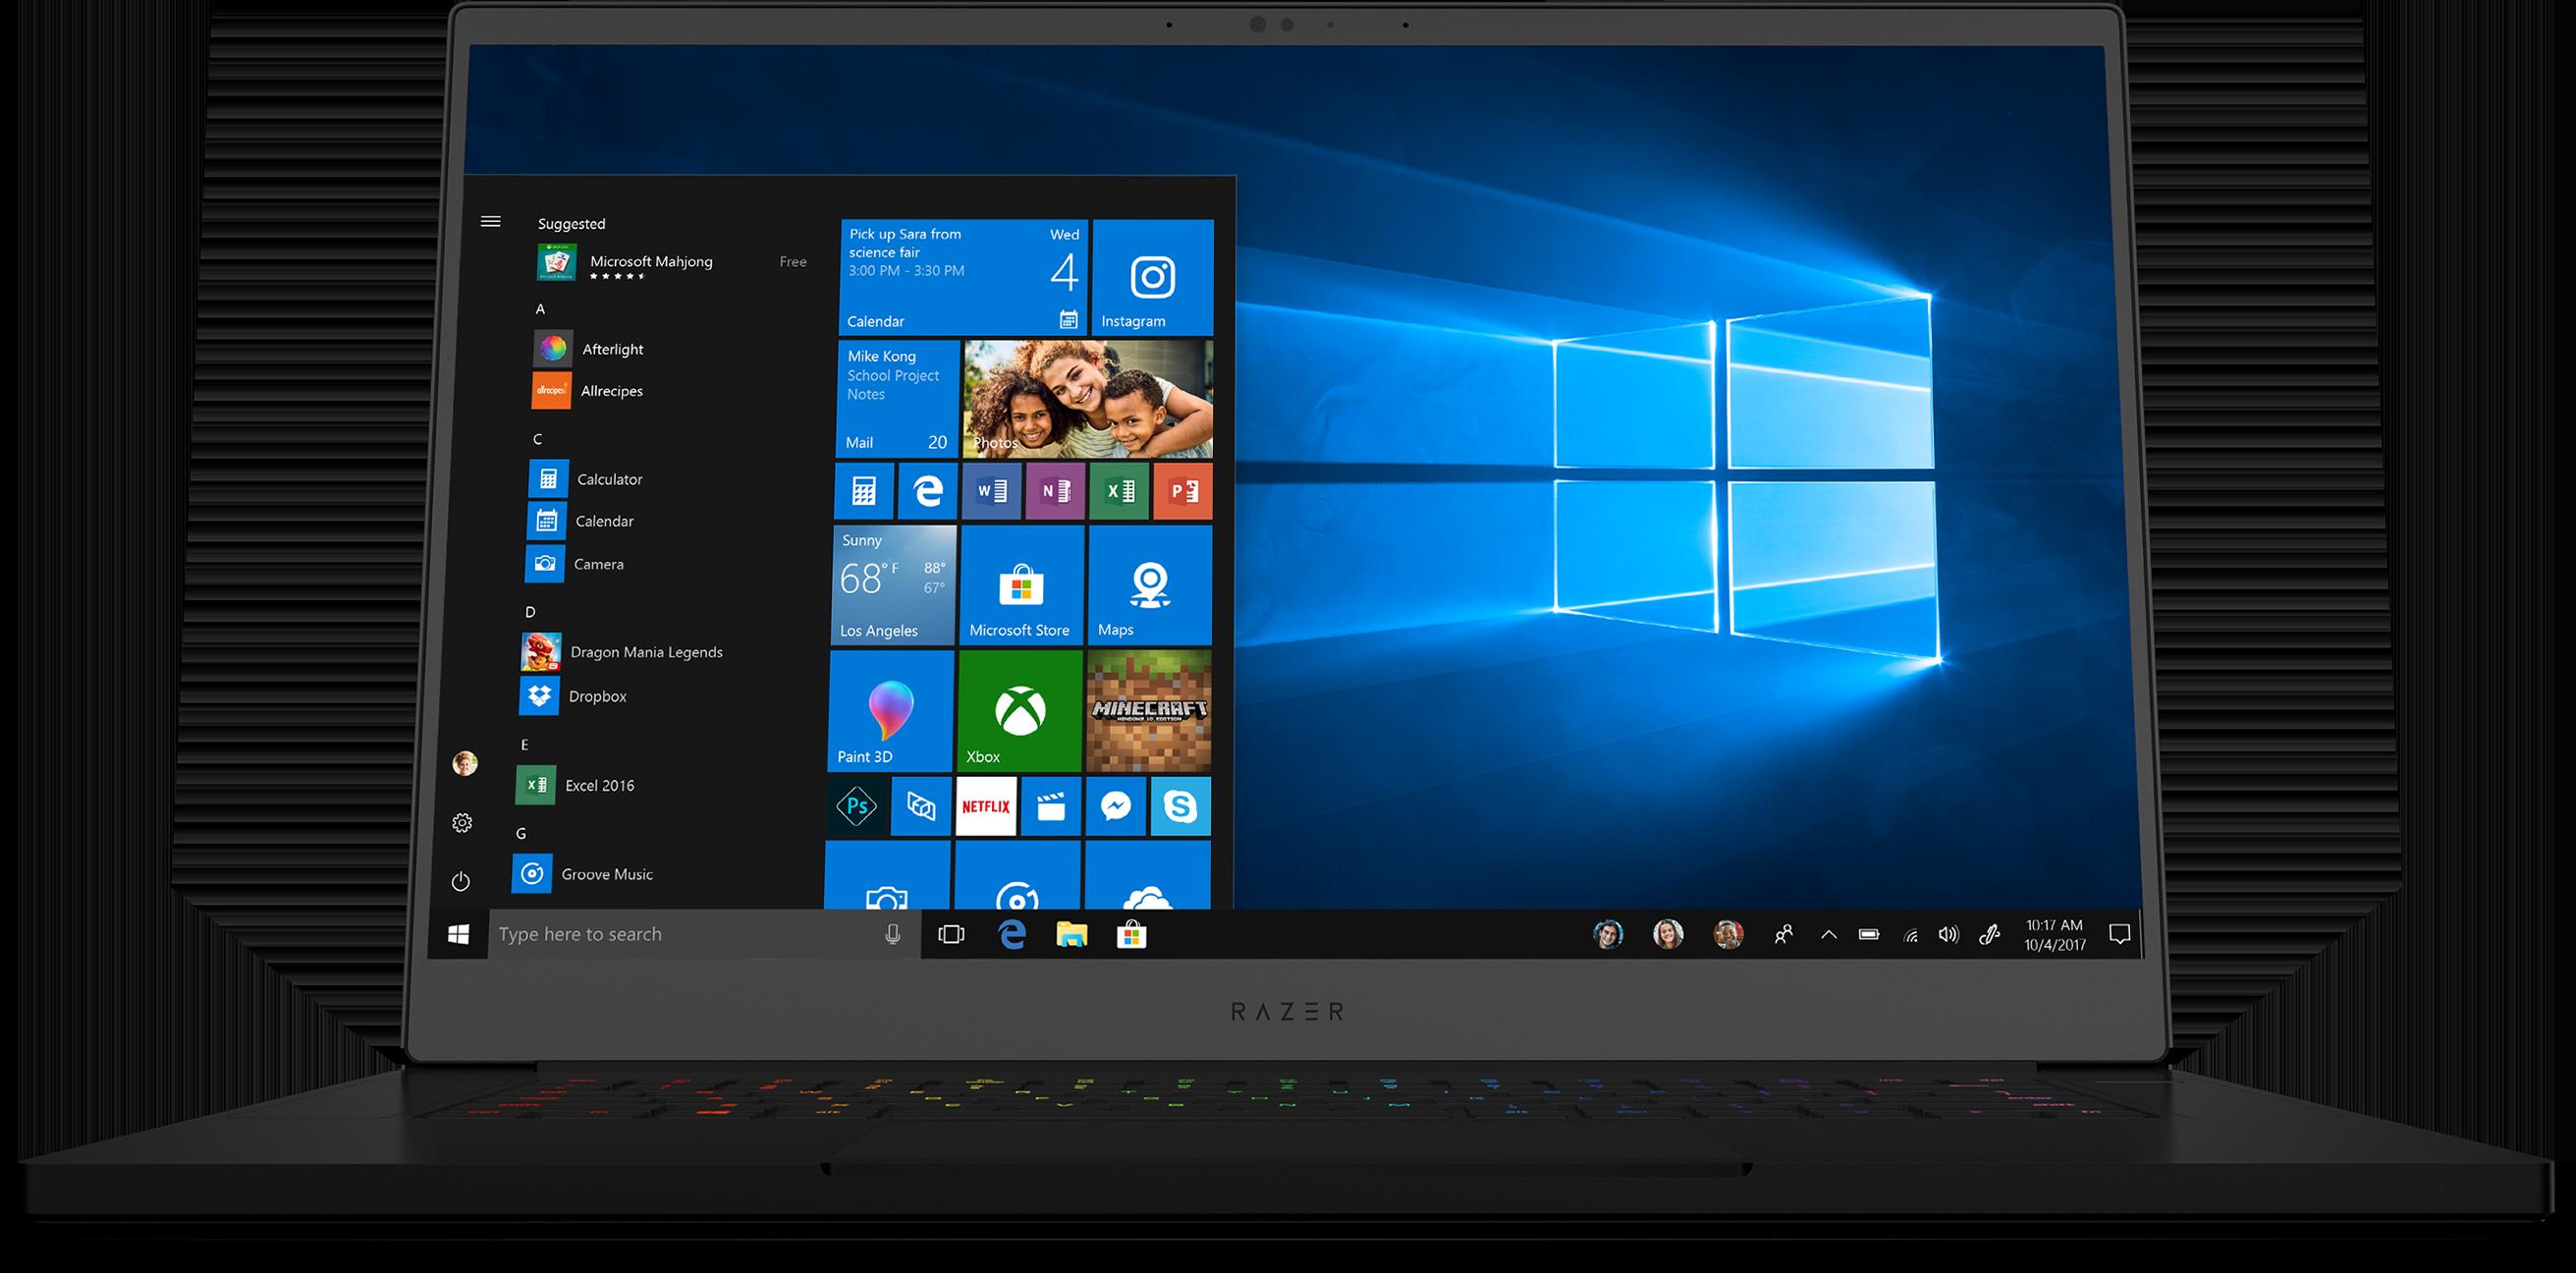 Front view of open Razer Blade laptop